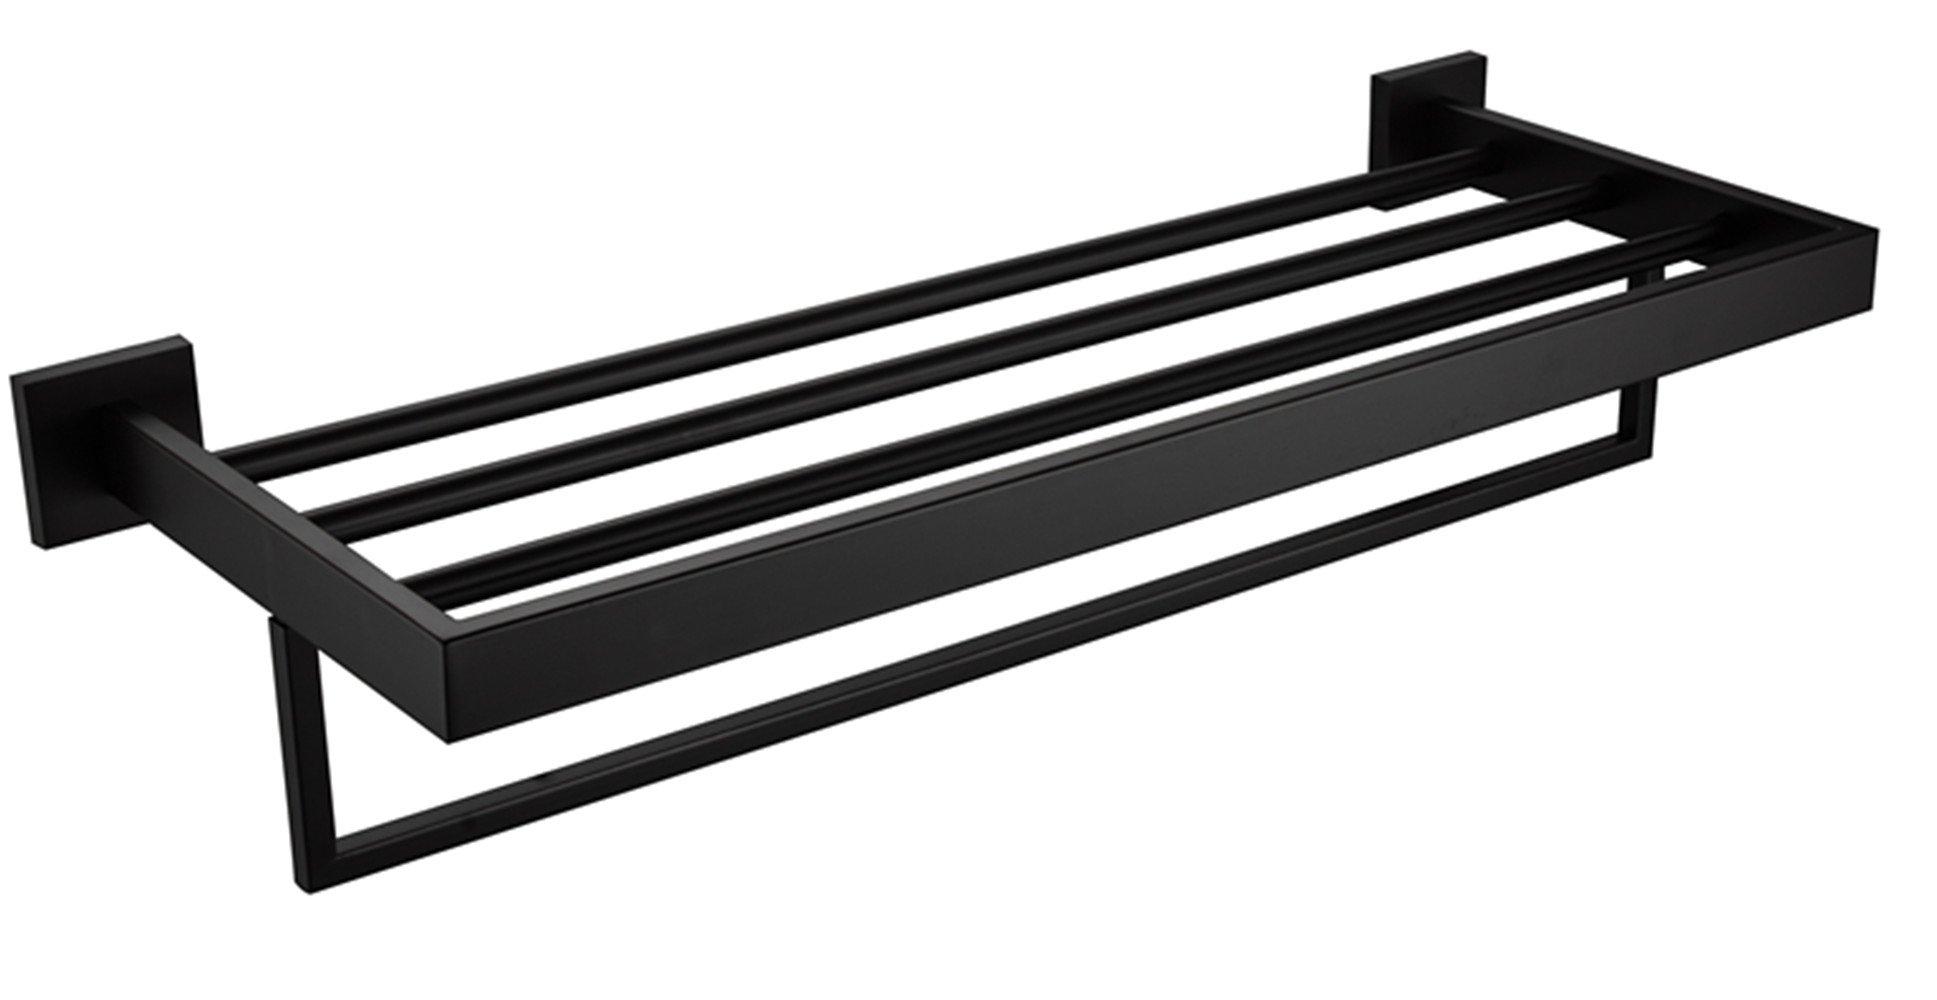 Turs Square Bathroom Bath Towel Rack with Single Towel Bar Wall Mount Shelf Rustproof Stainless Steel, Black